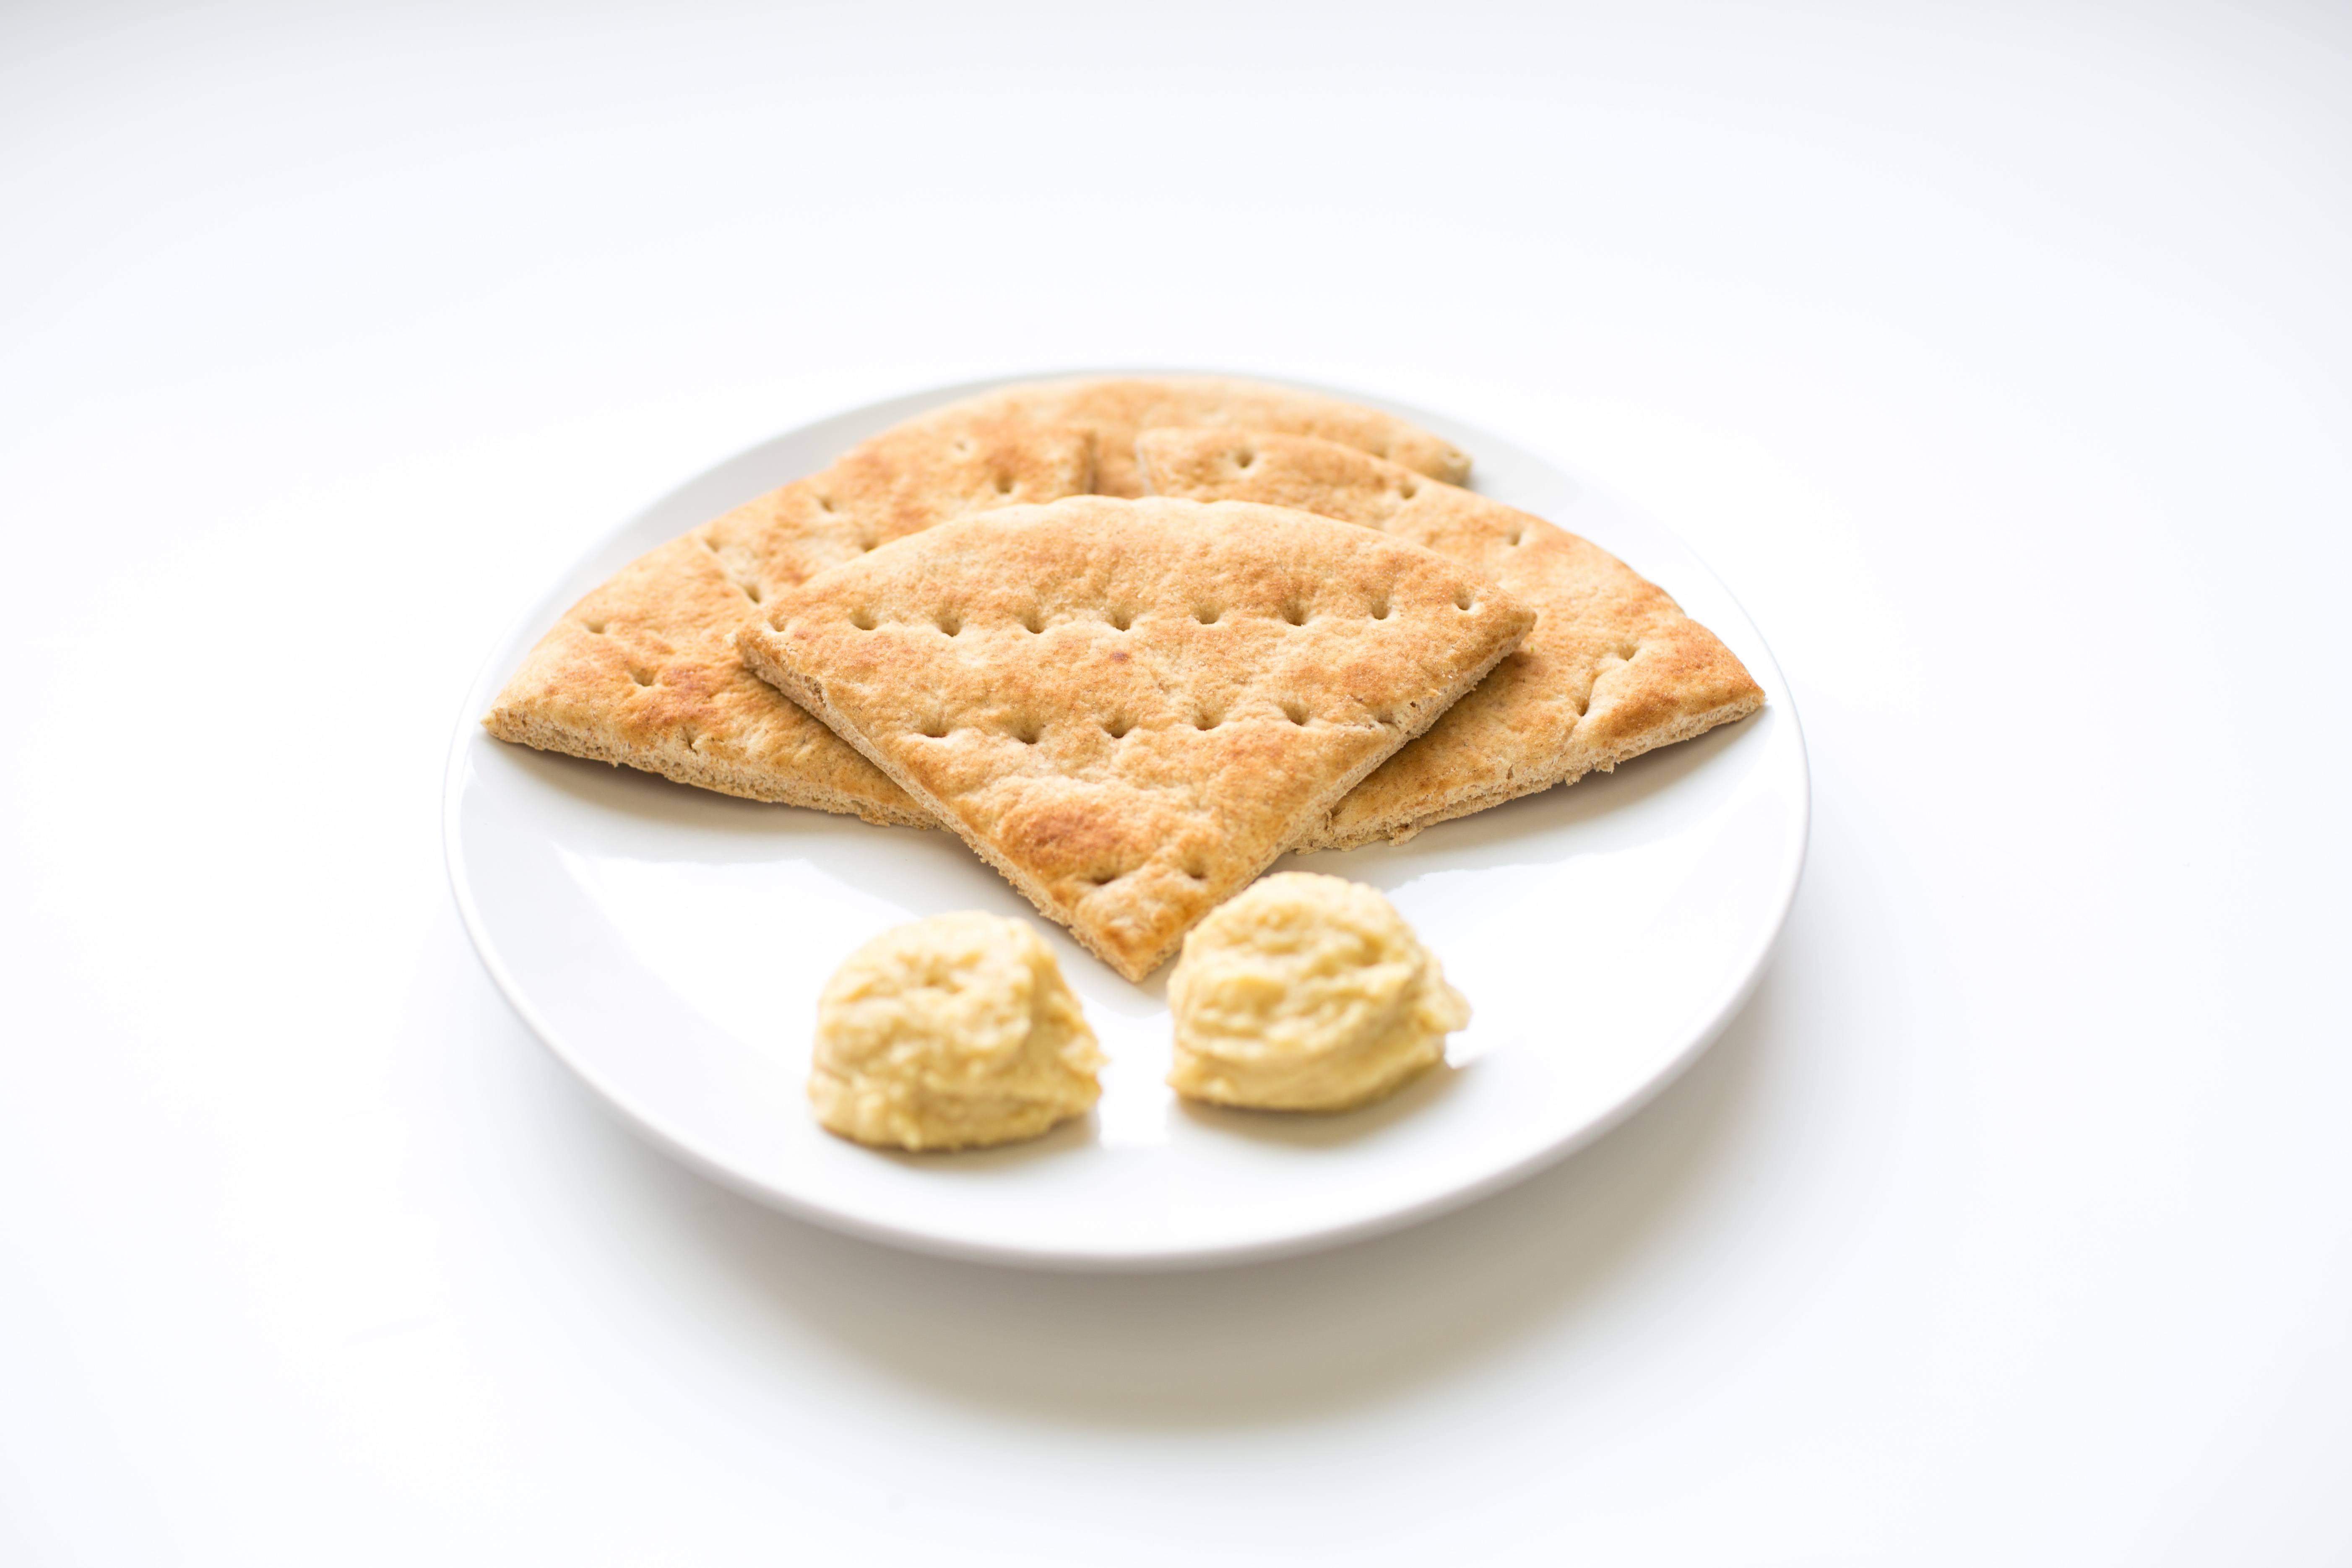 100 calorie snack Joseph's pita and hummus